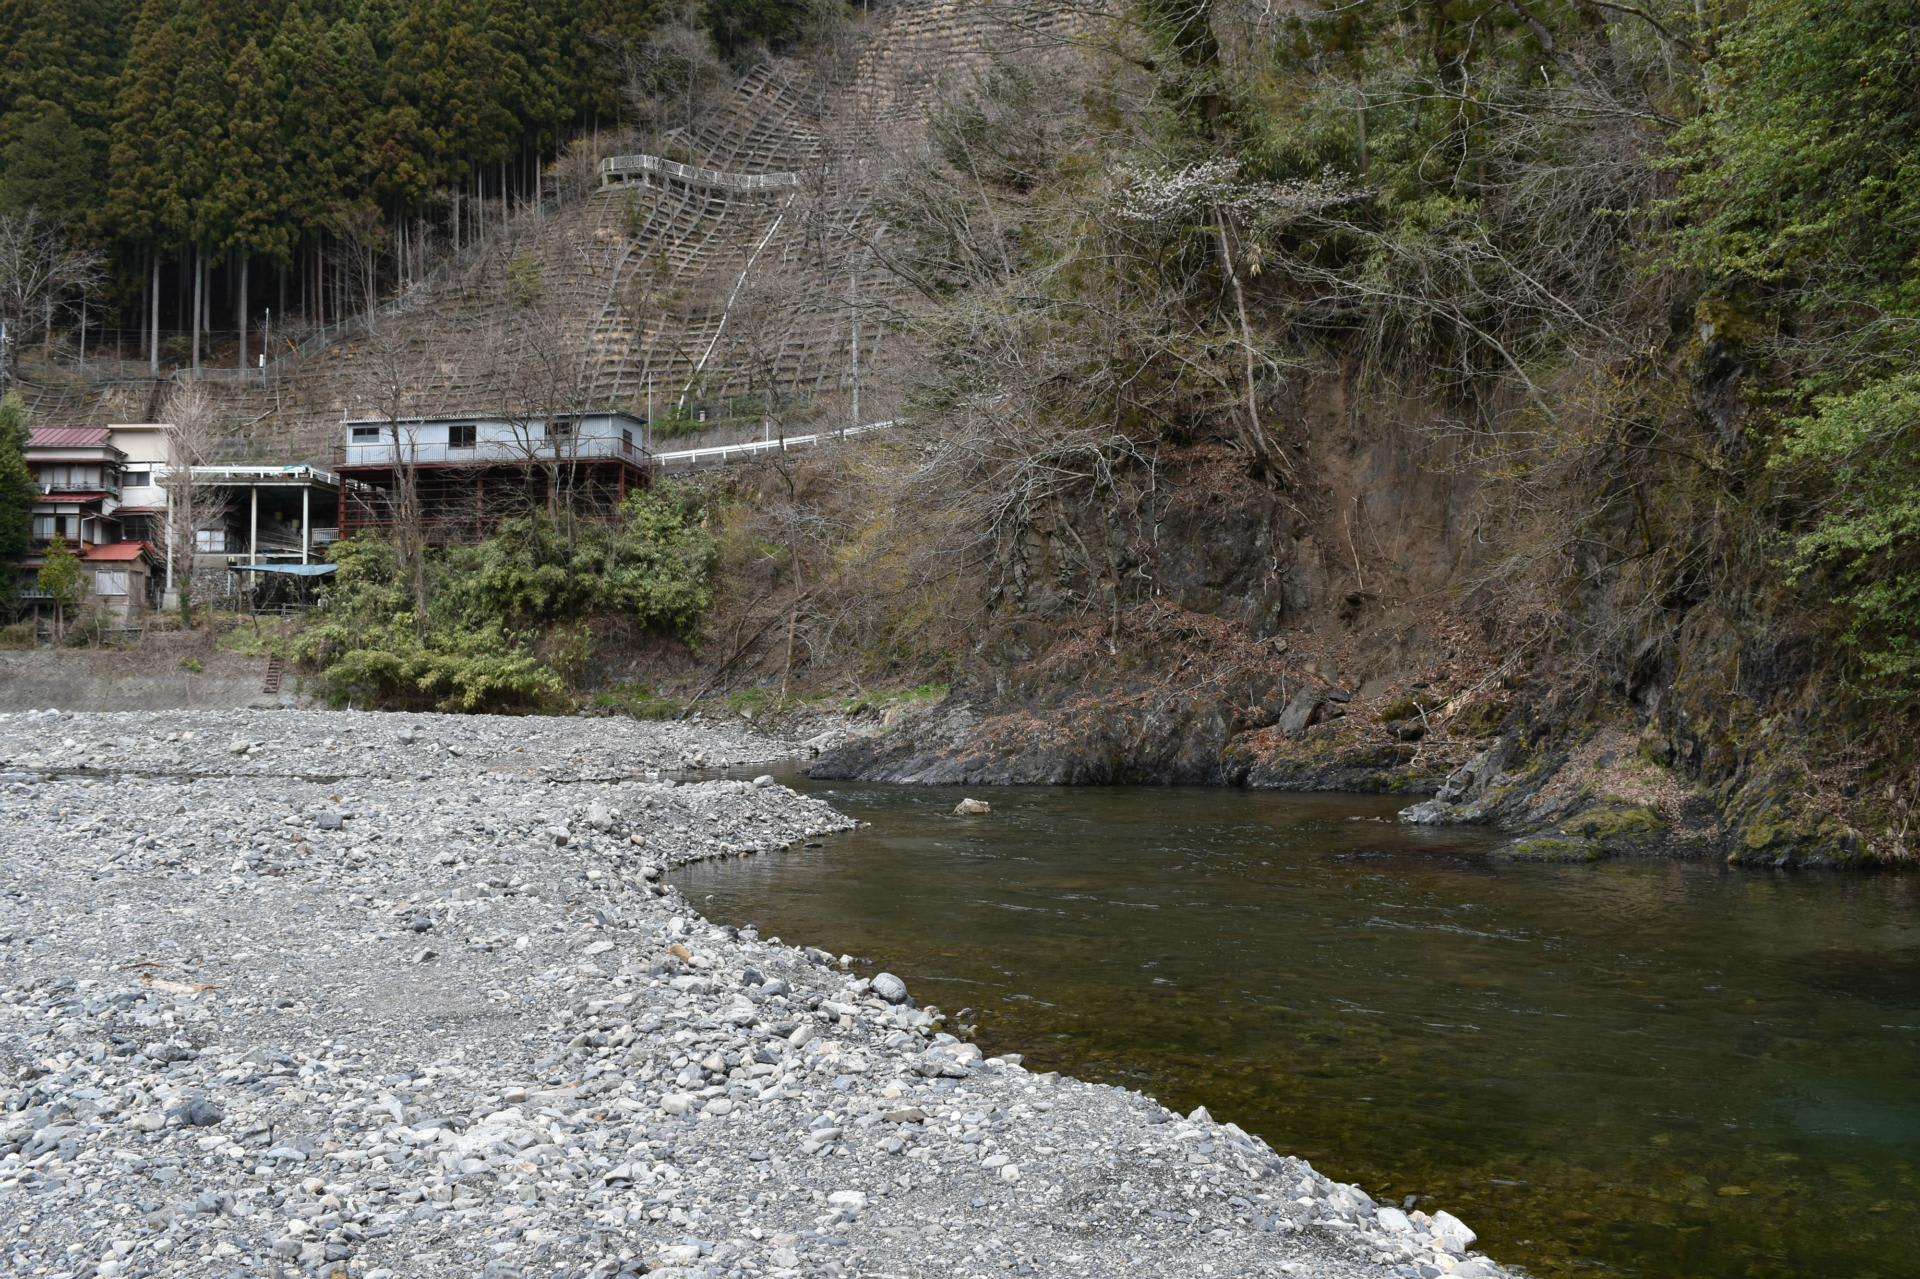 山梨県丹波山村丹波川へ釣り - 漢方相談 昌栄薬品